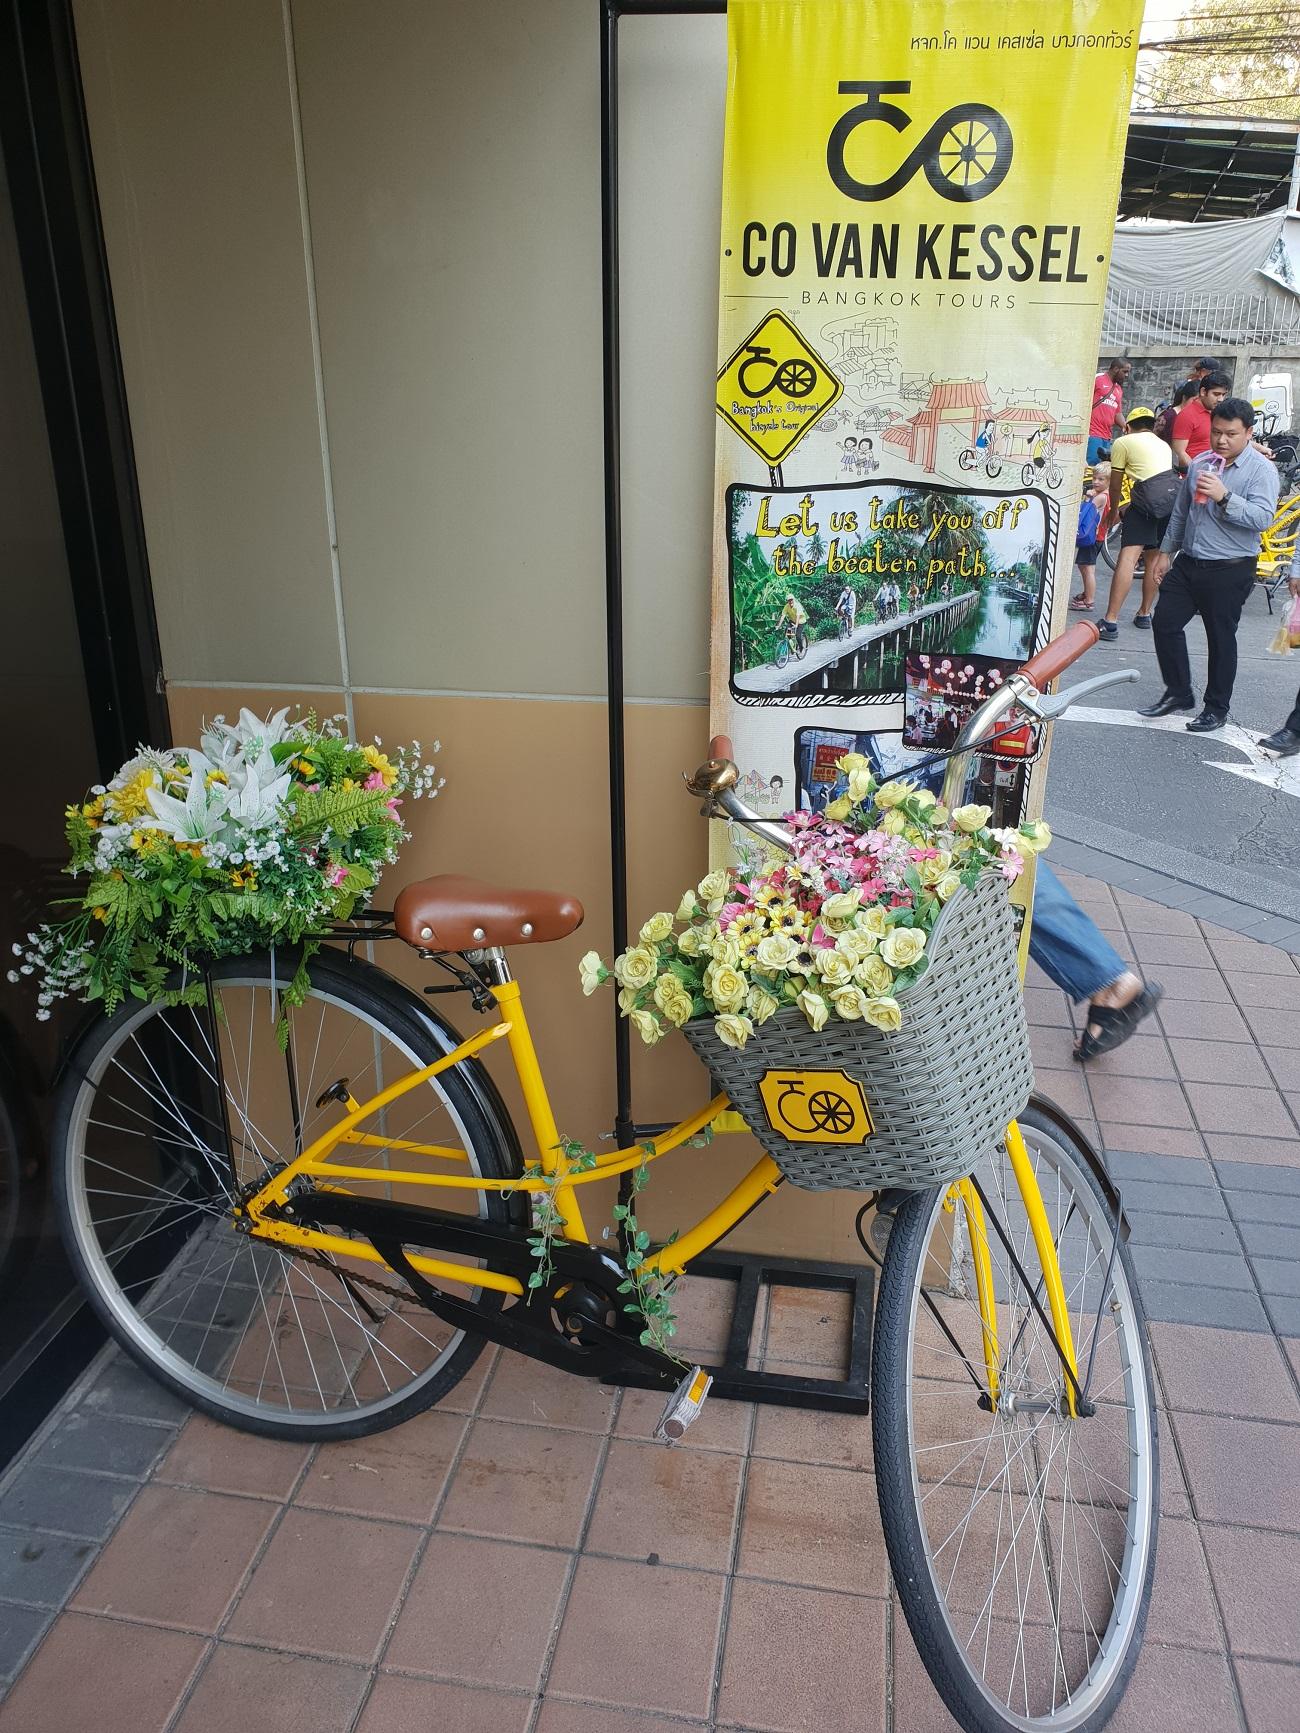 Co van Kessel in Bangkok